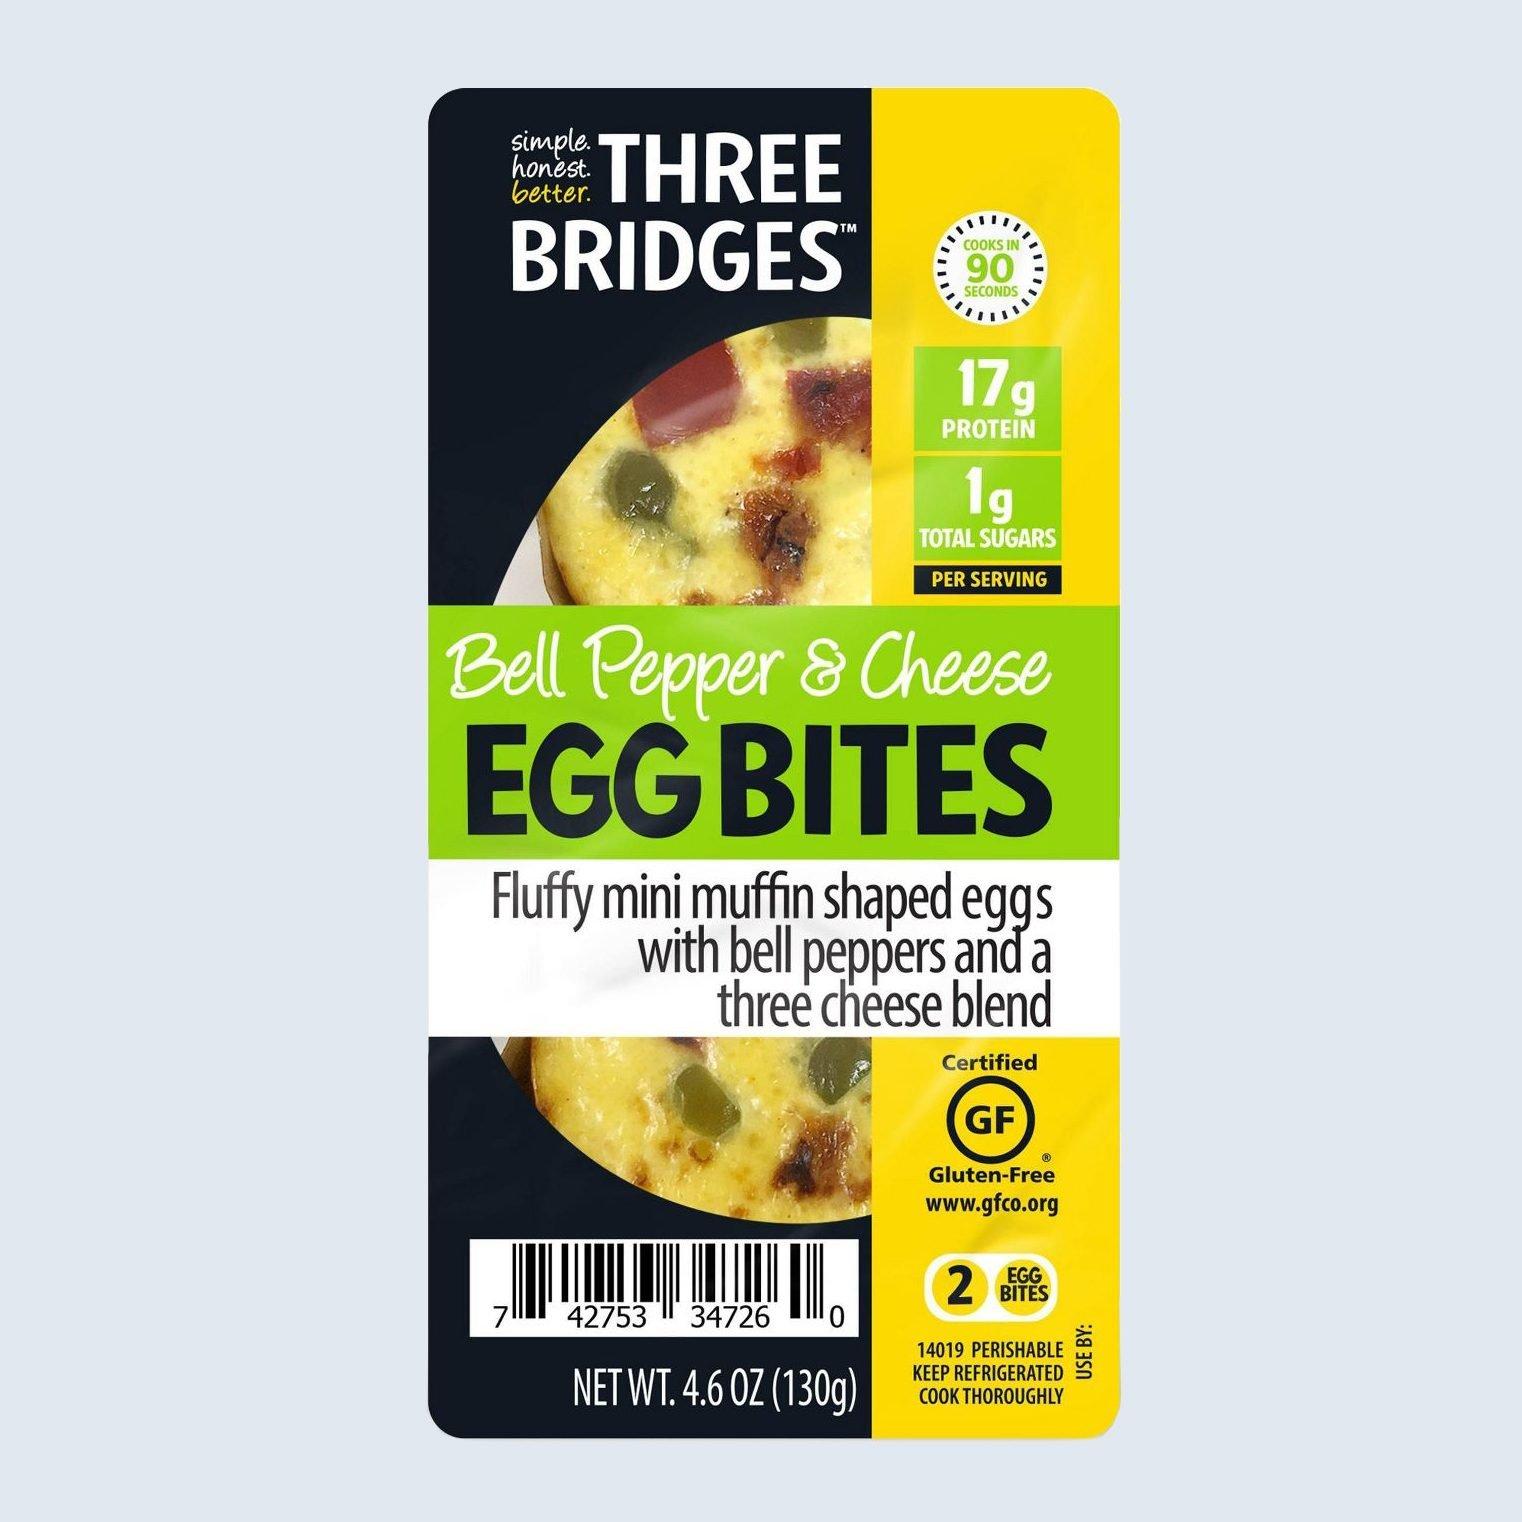 Three Bridges Bell Pepper & Cheese Egg Bites